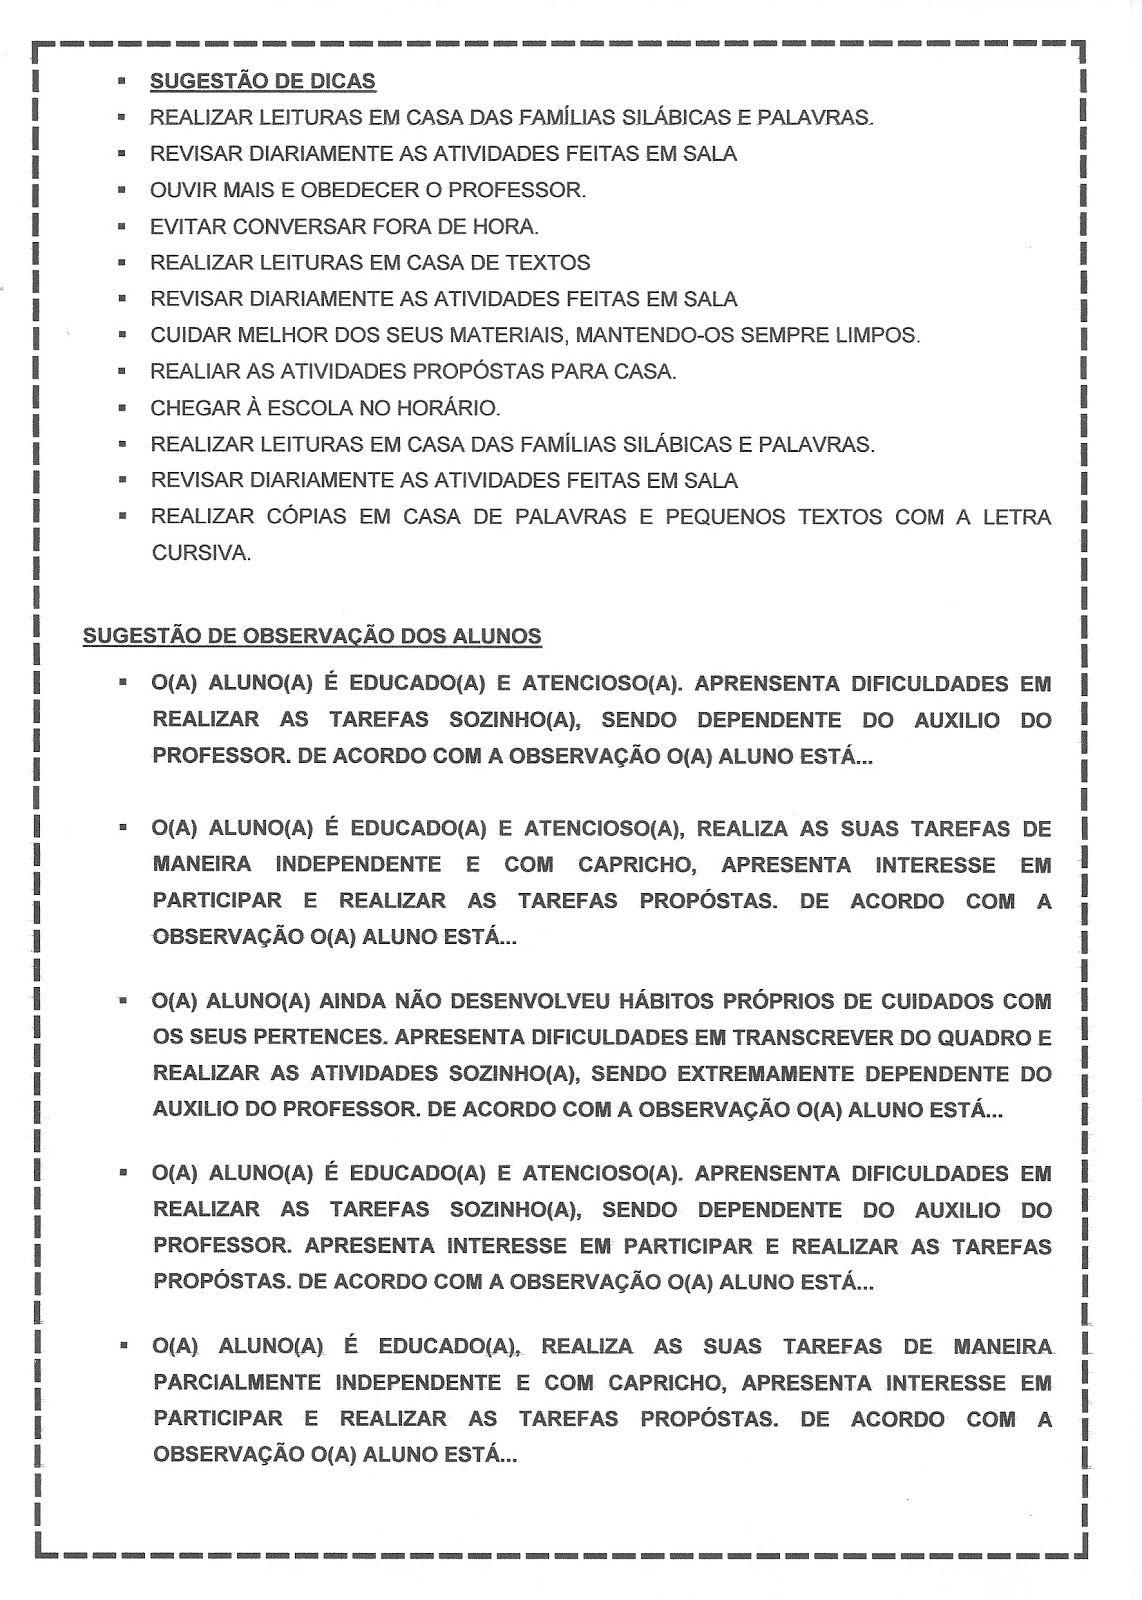 Mundo Do Professor Ficha De Observacao Individual Relatorios